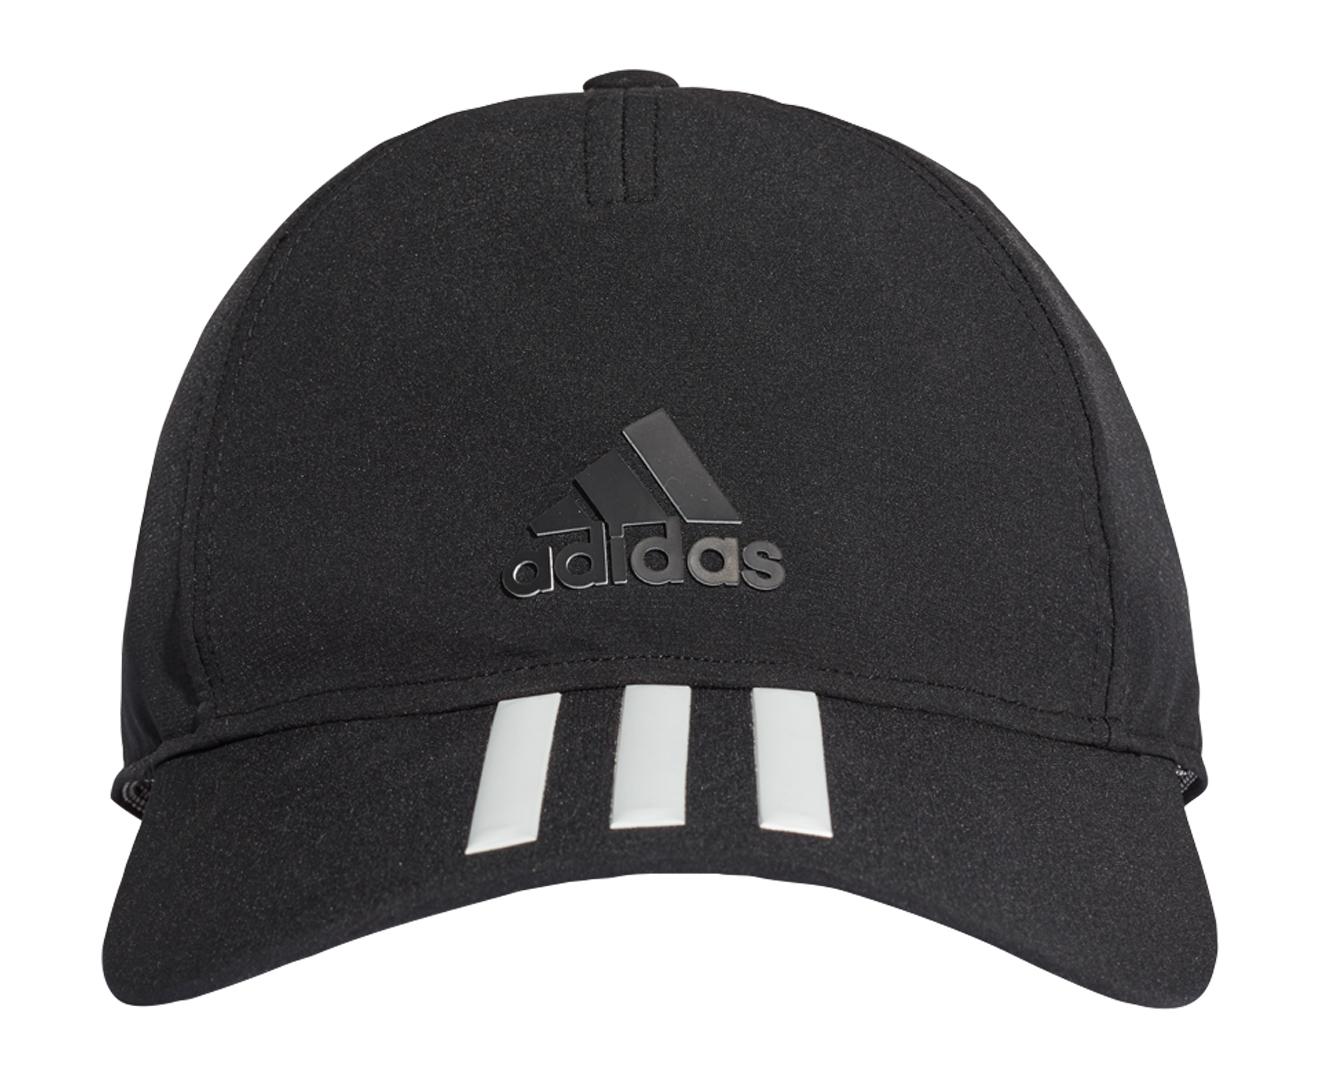 a88b5570f65 Adidas C40 3-Stripe Climalite Cap - Black Black White 4059326507072 ...